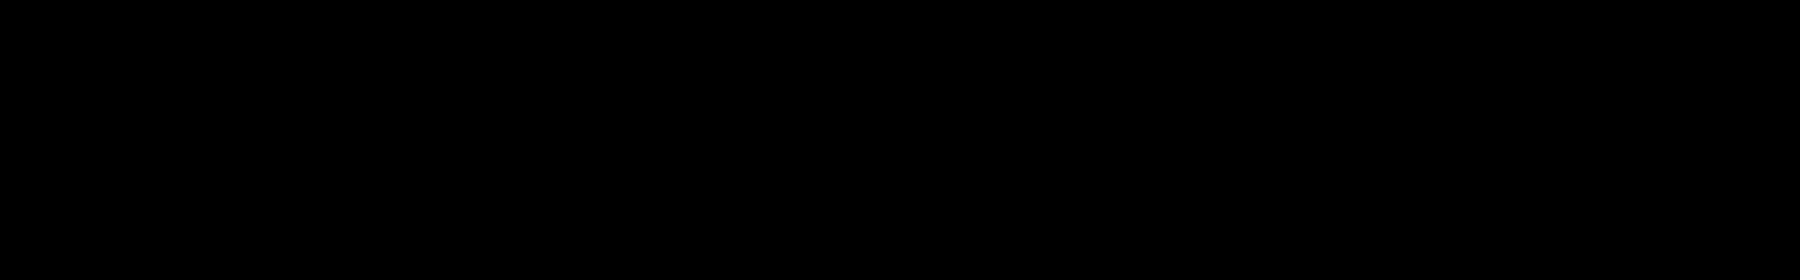 Ableton EDM Thunder Template audio waveform